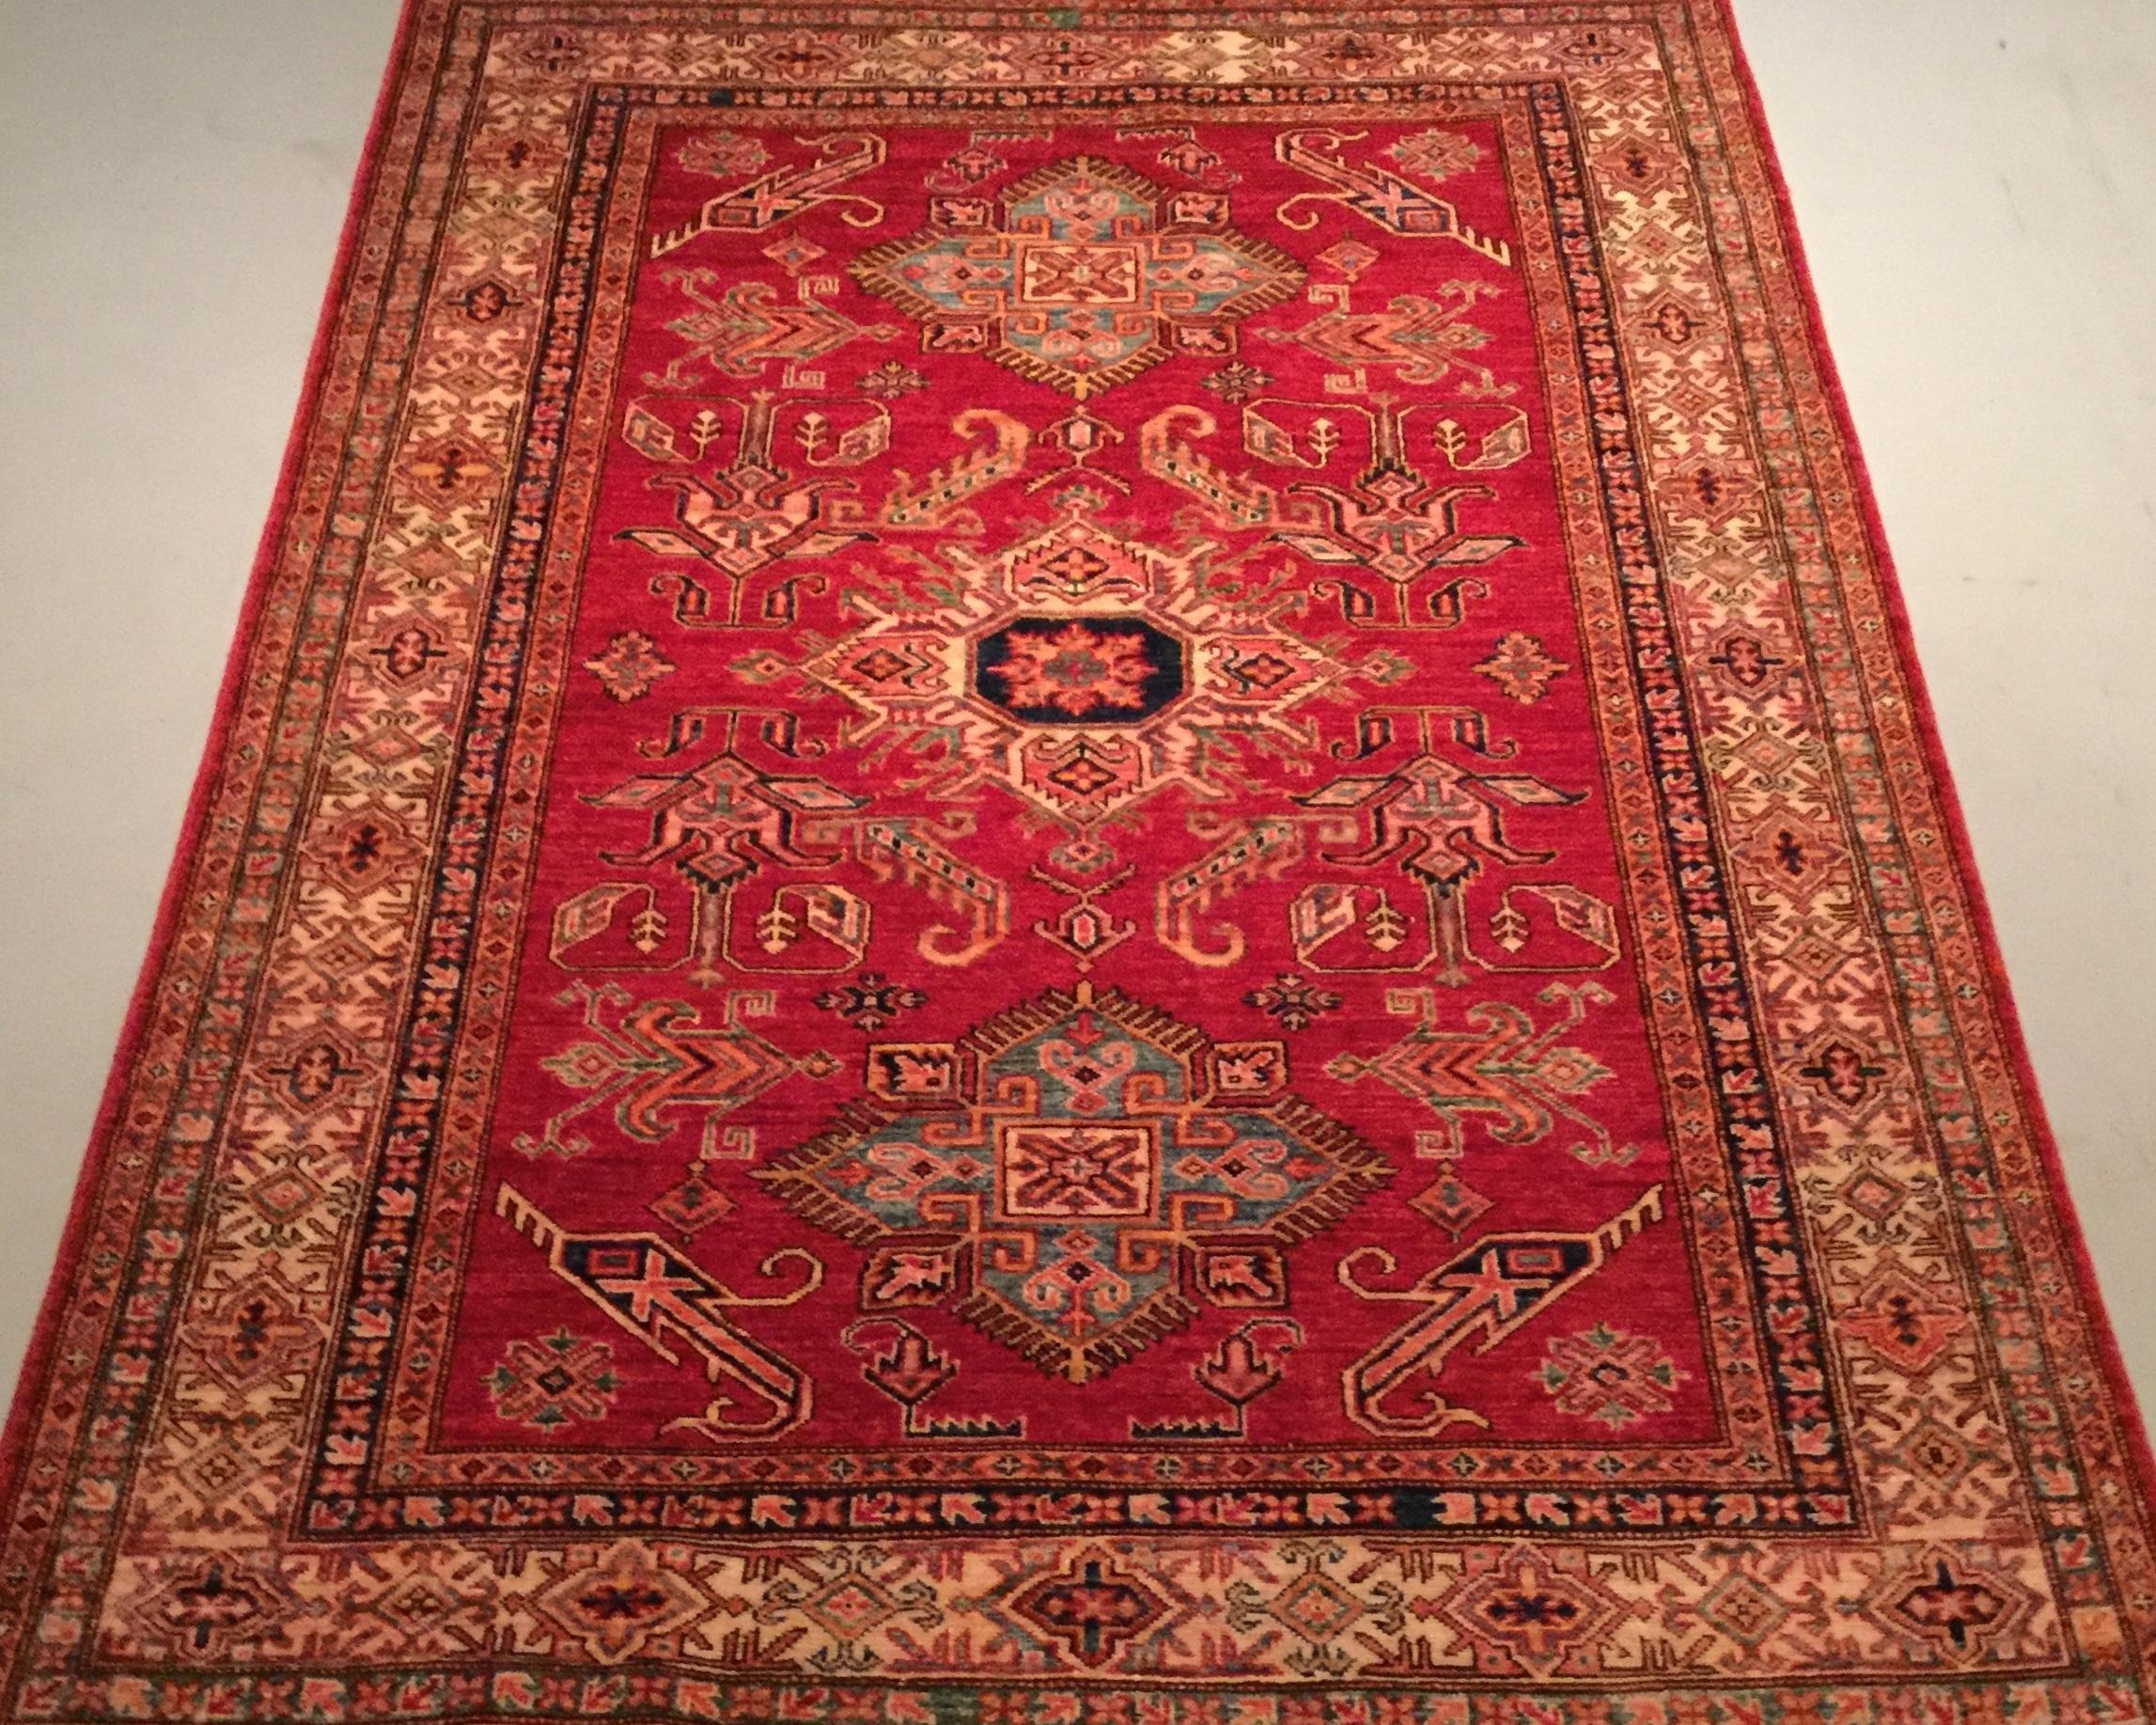 Afghan Kazak - Circa 2000'sSize Measurements: 220cm x 150cm